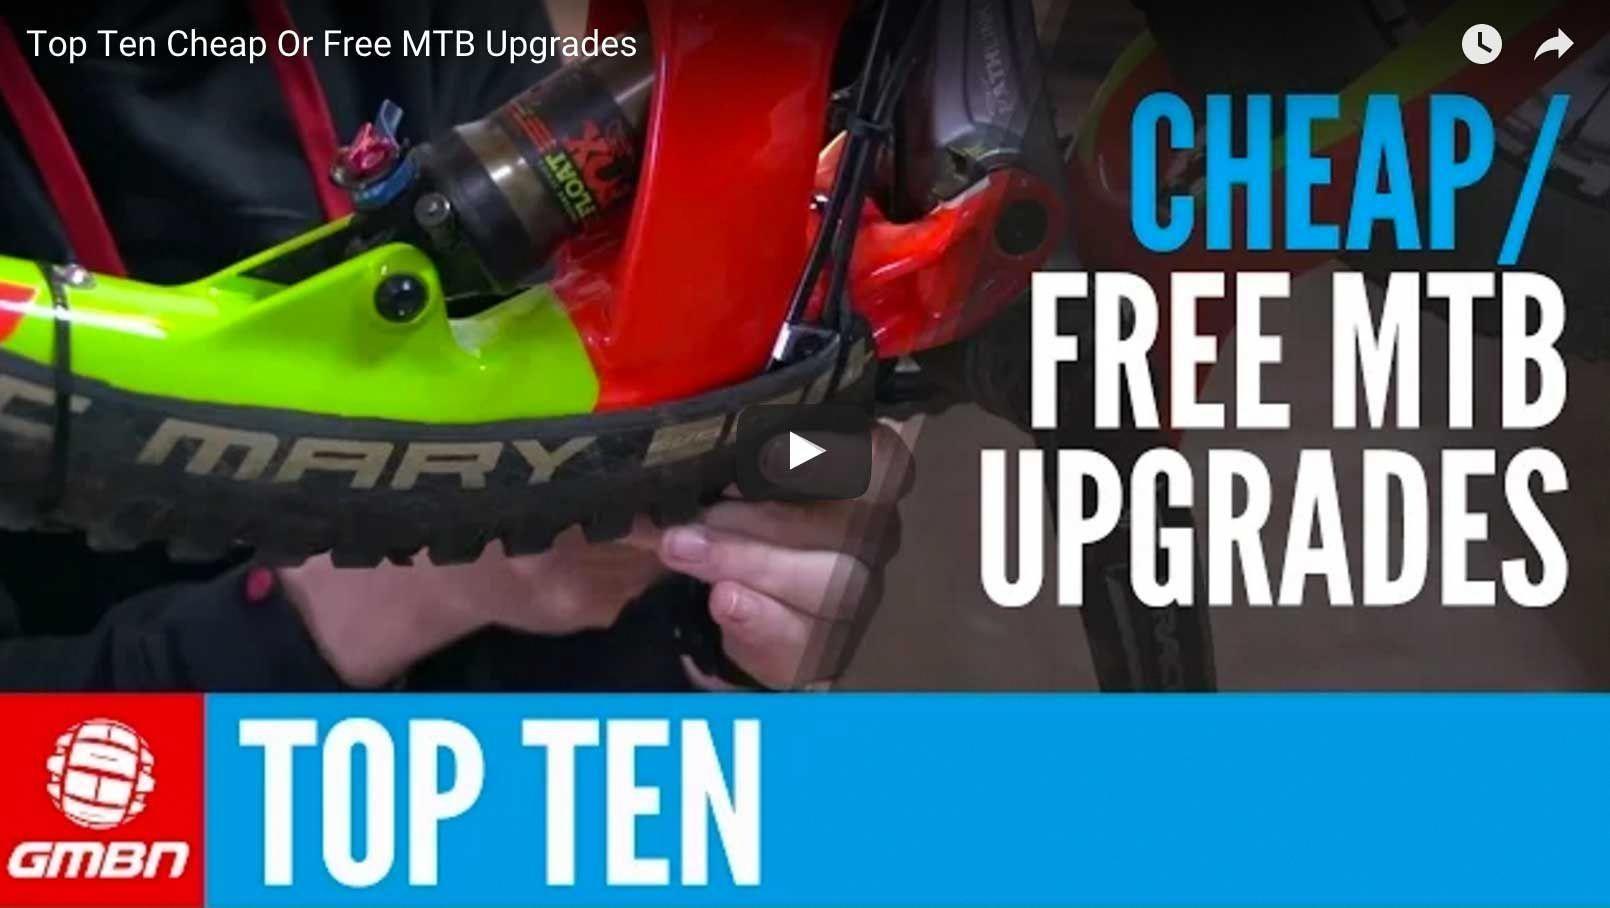 10 Diy Mtb Upgrades Www Parkcitymountainbike Com Top 10 Diy